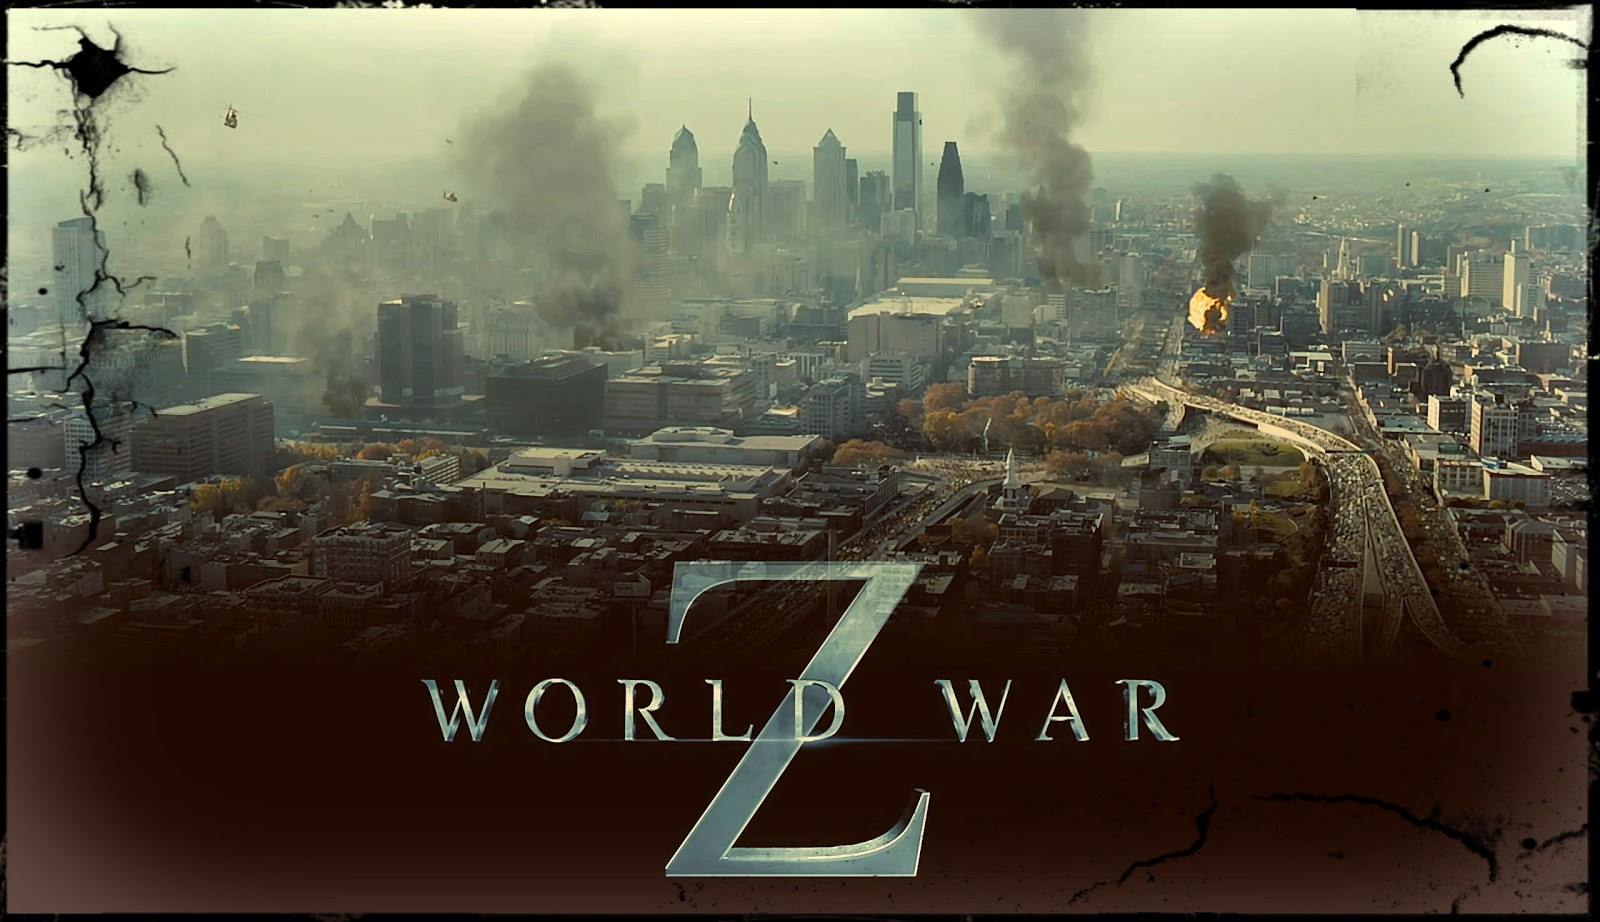 http://1.bp.blogspot.com/-C433BAU2Cyo/UWaOfm_3tnI/AAAAAAABXpA/ZWpWaC9Rih8/s1600/Guerra+Mundial+Z+-+Preview.jpg